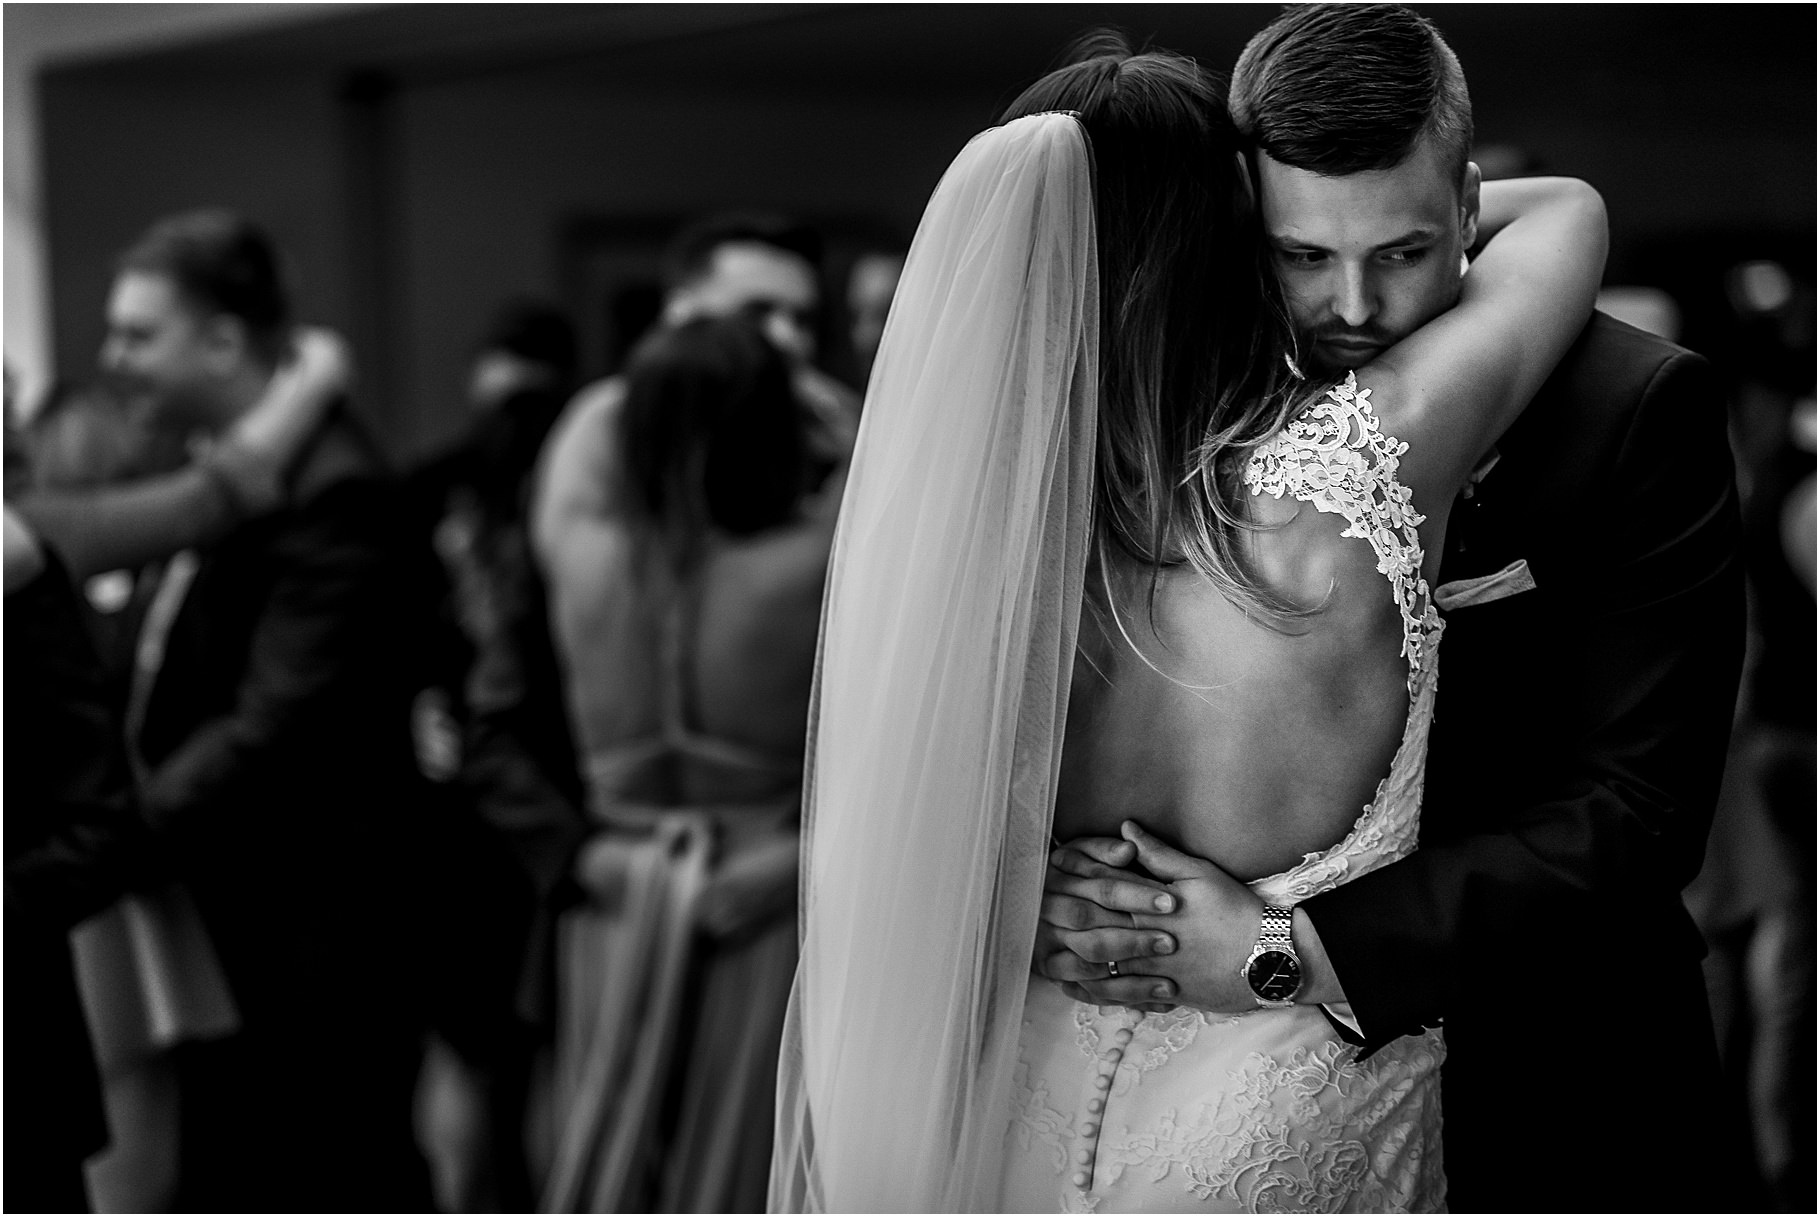 dan-wootton-photography-2017-weddings-139.jpg